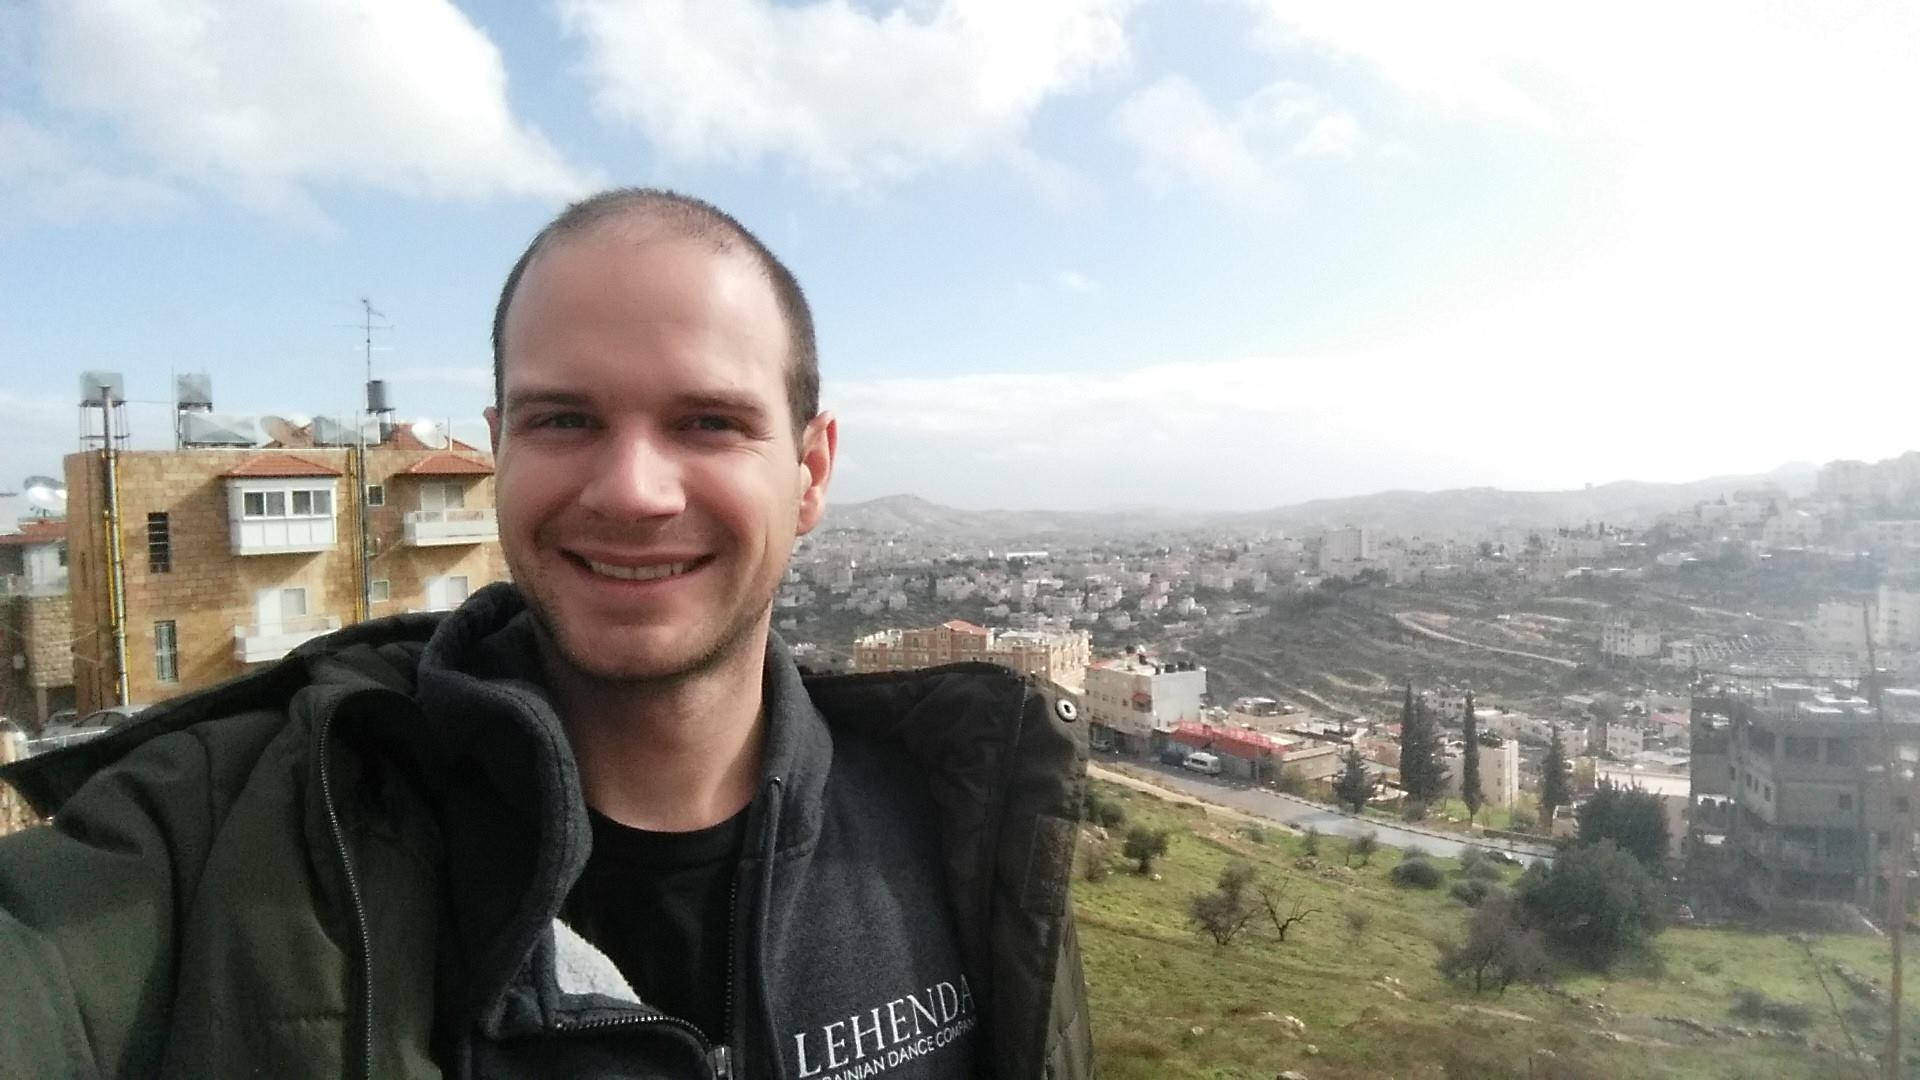 Anthony at Shephard's Fields in Bethlehem